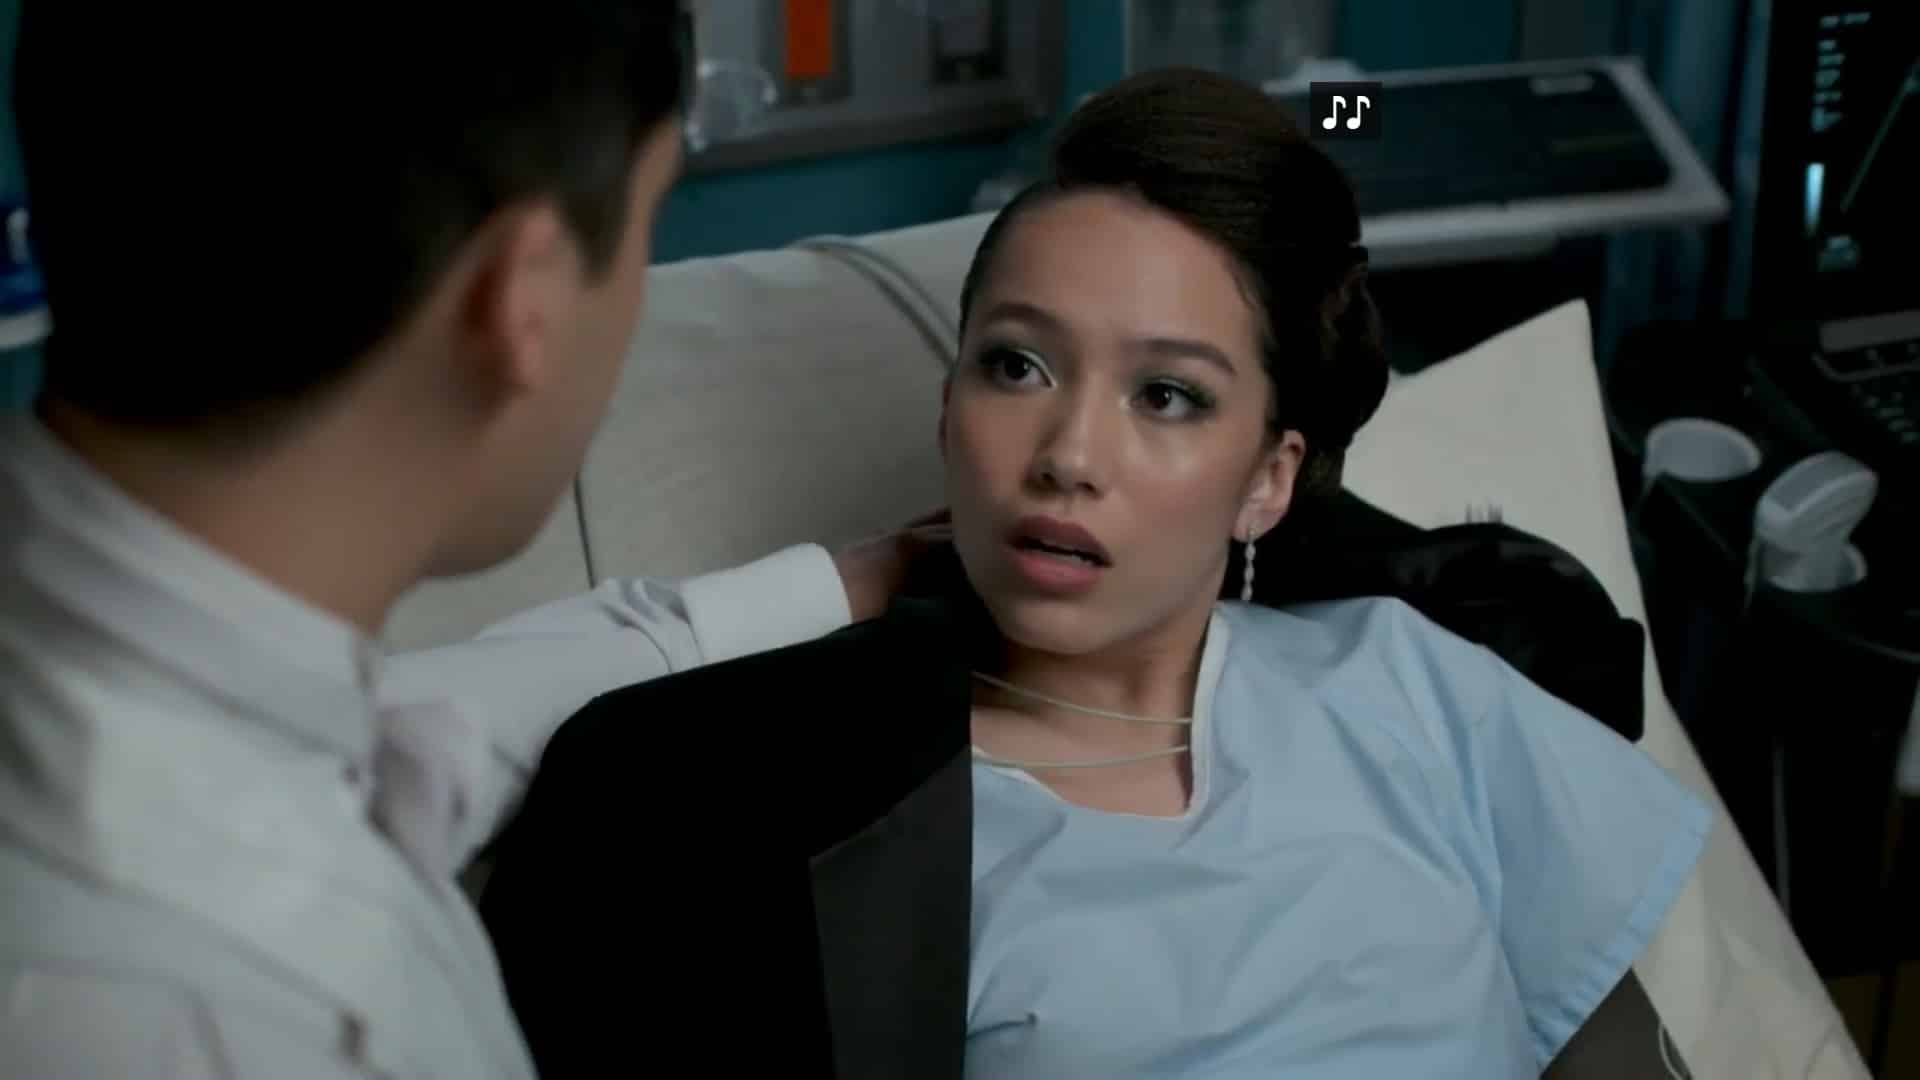 Maya (Jasmine Vega) in a hospital bed